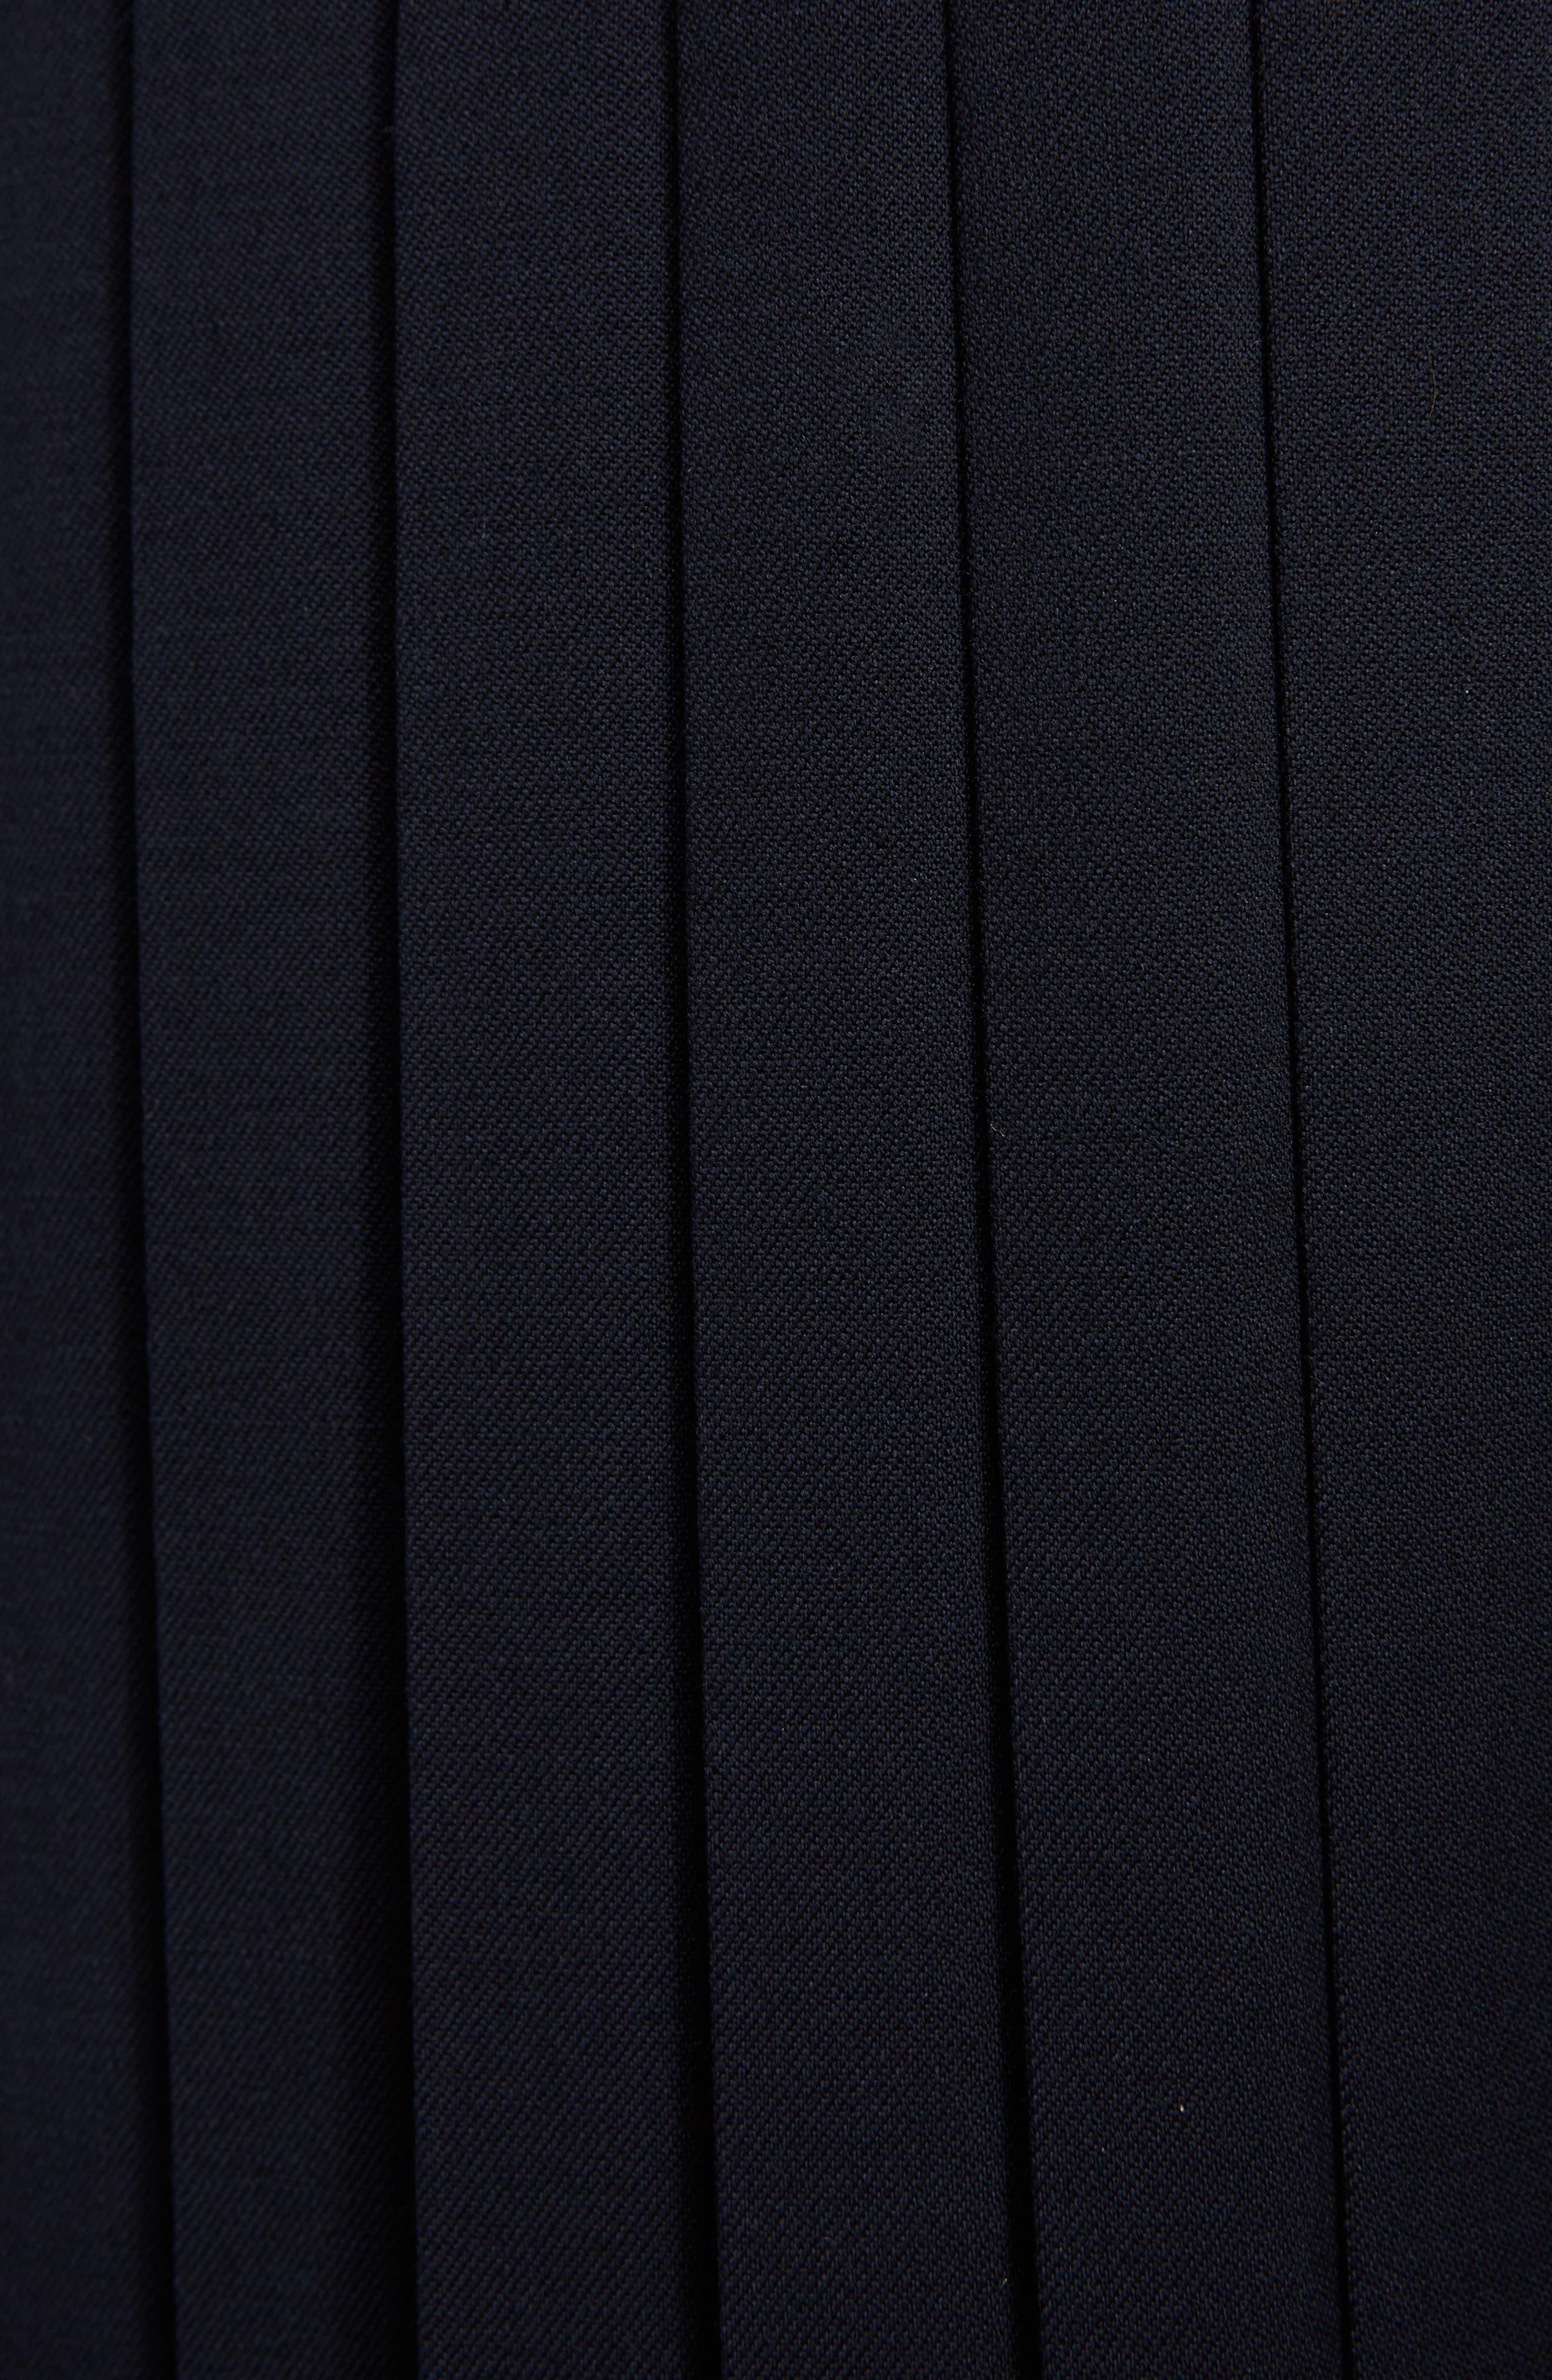 Pleated Wool Blend Skirt,                             Alternate thumbnail 3, color,                             Navy